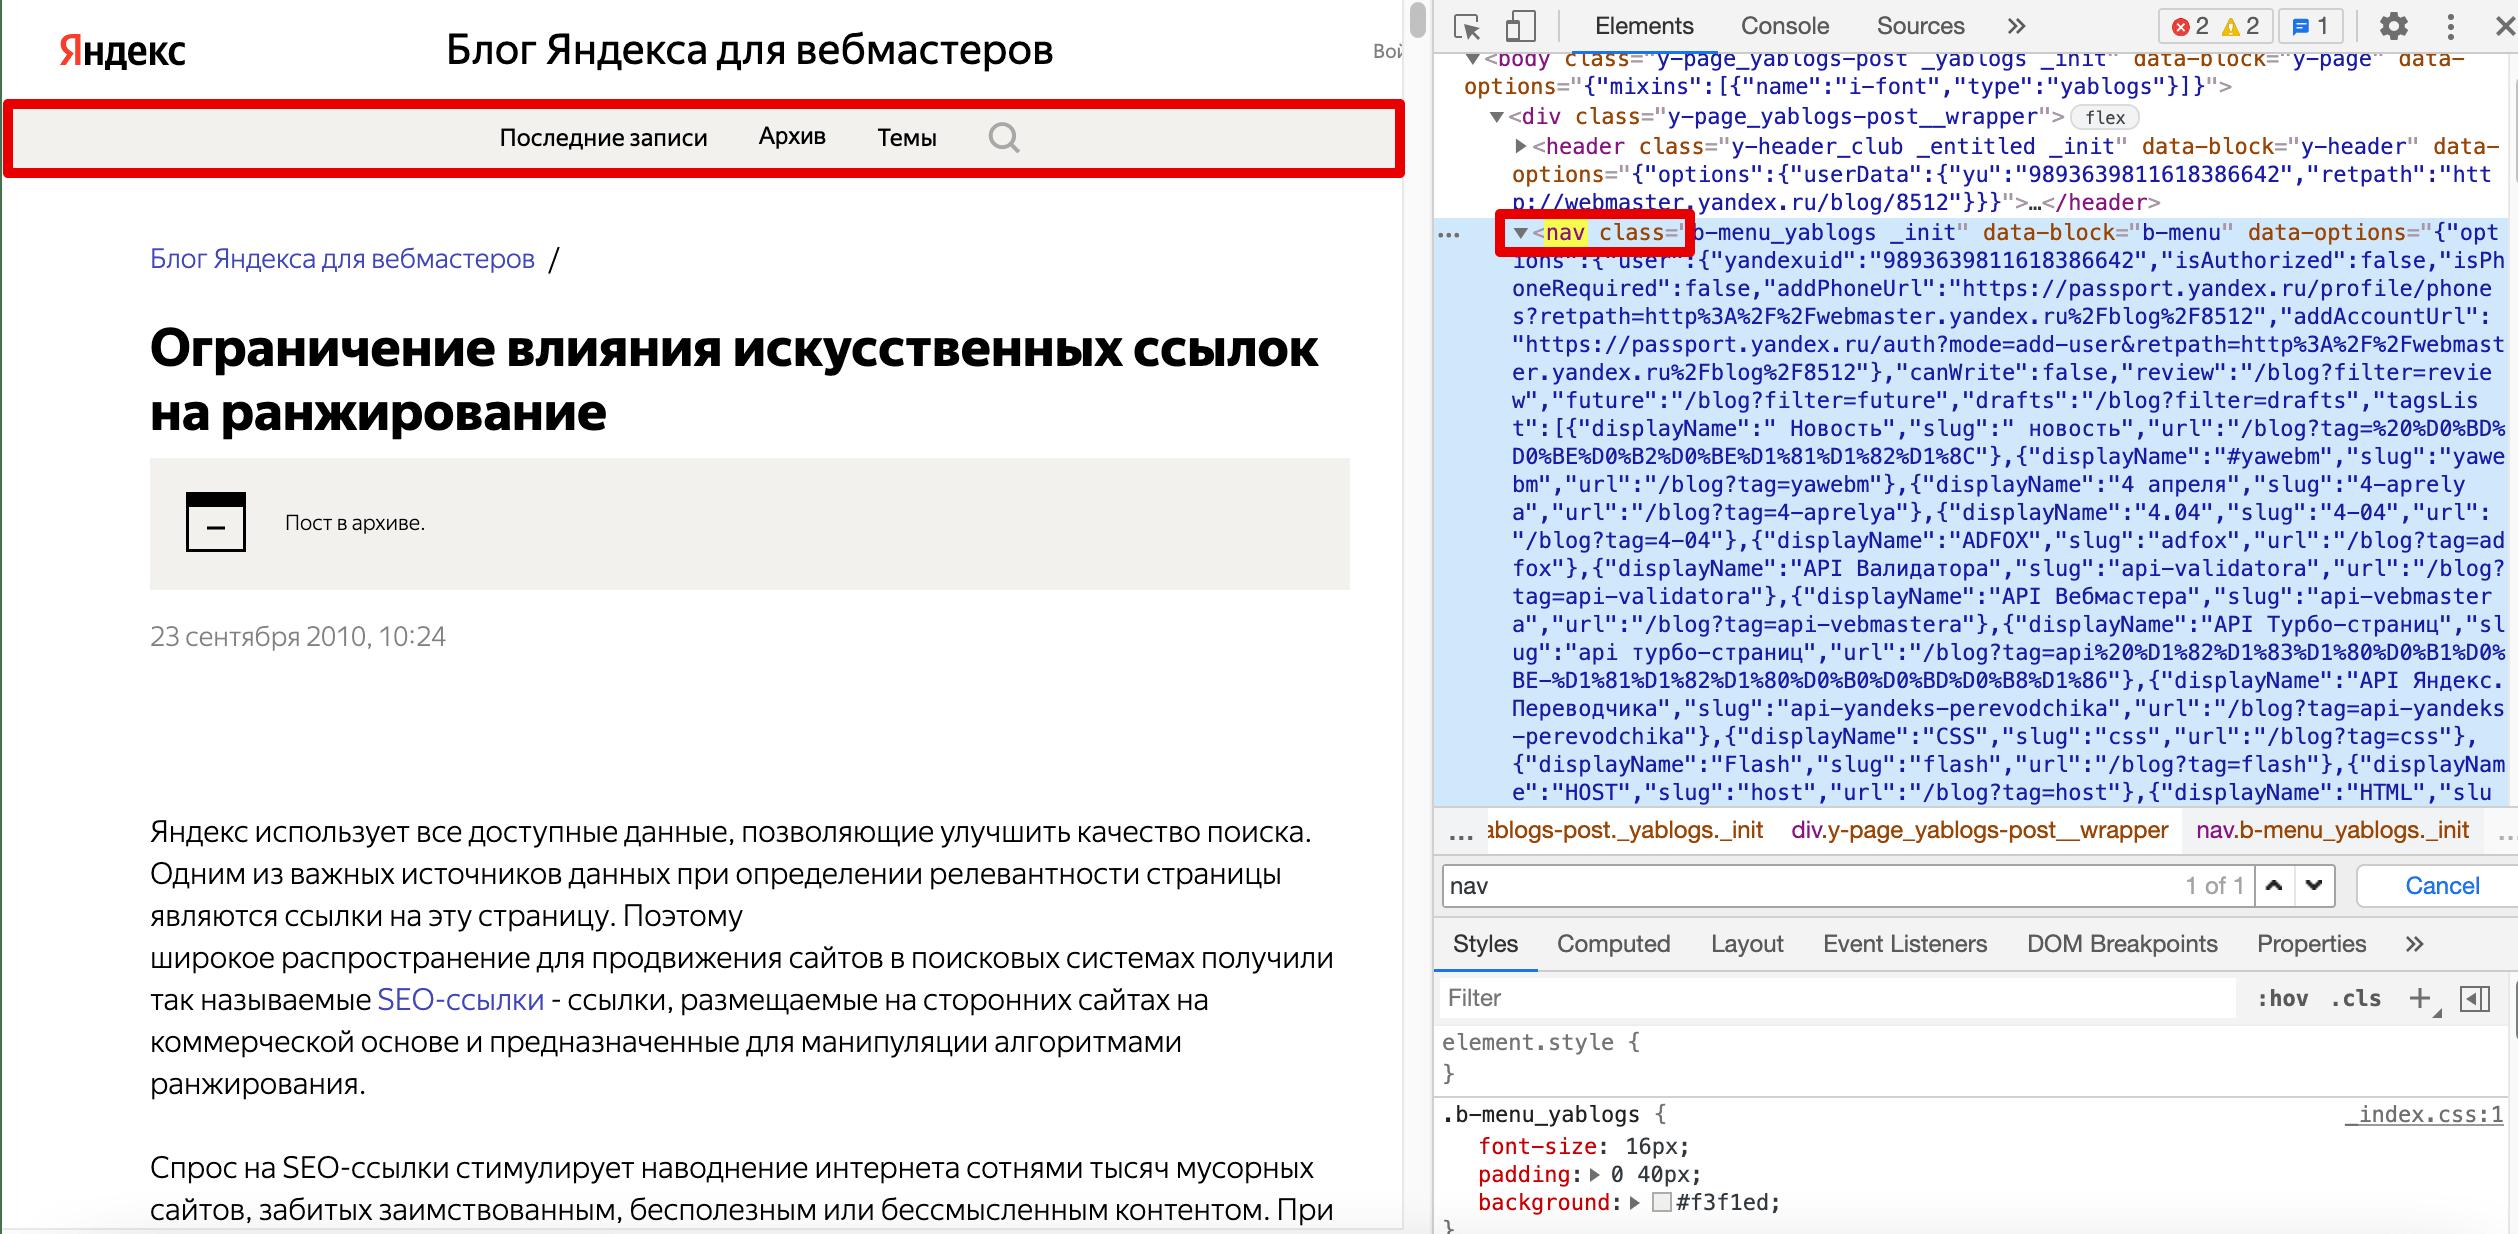 Тег nav в коде сайта